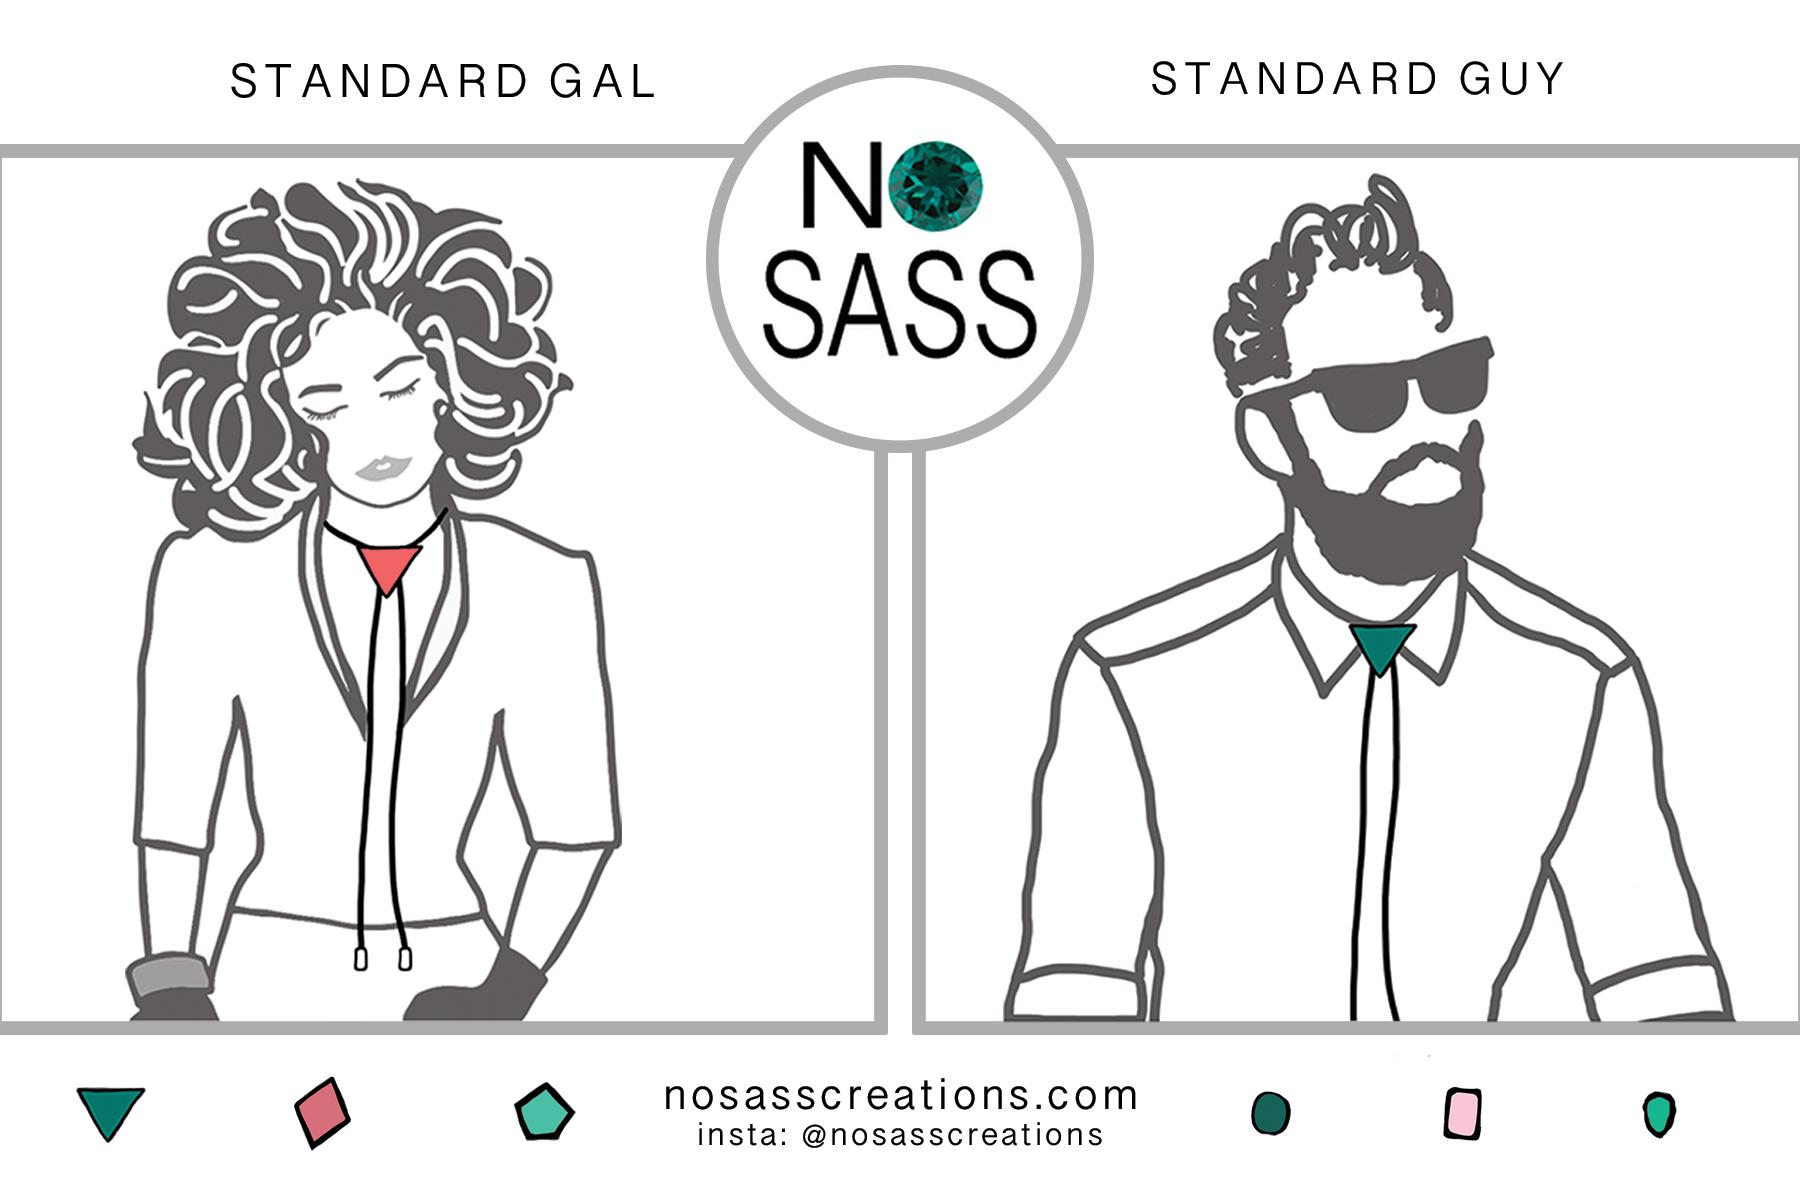 NoSass-4x6-WearMe-PostCard-Back.jpg